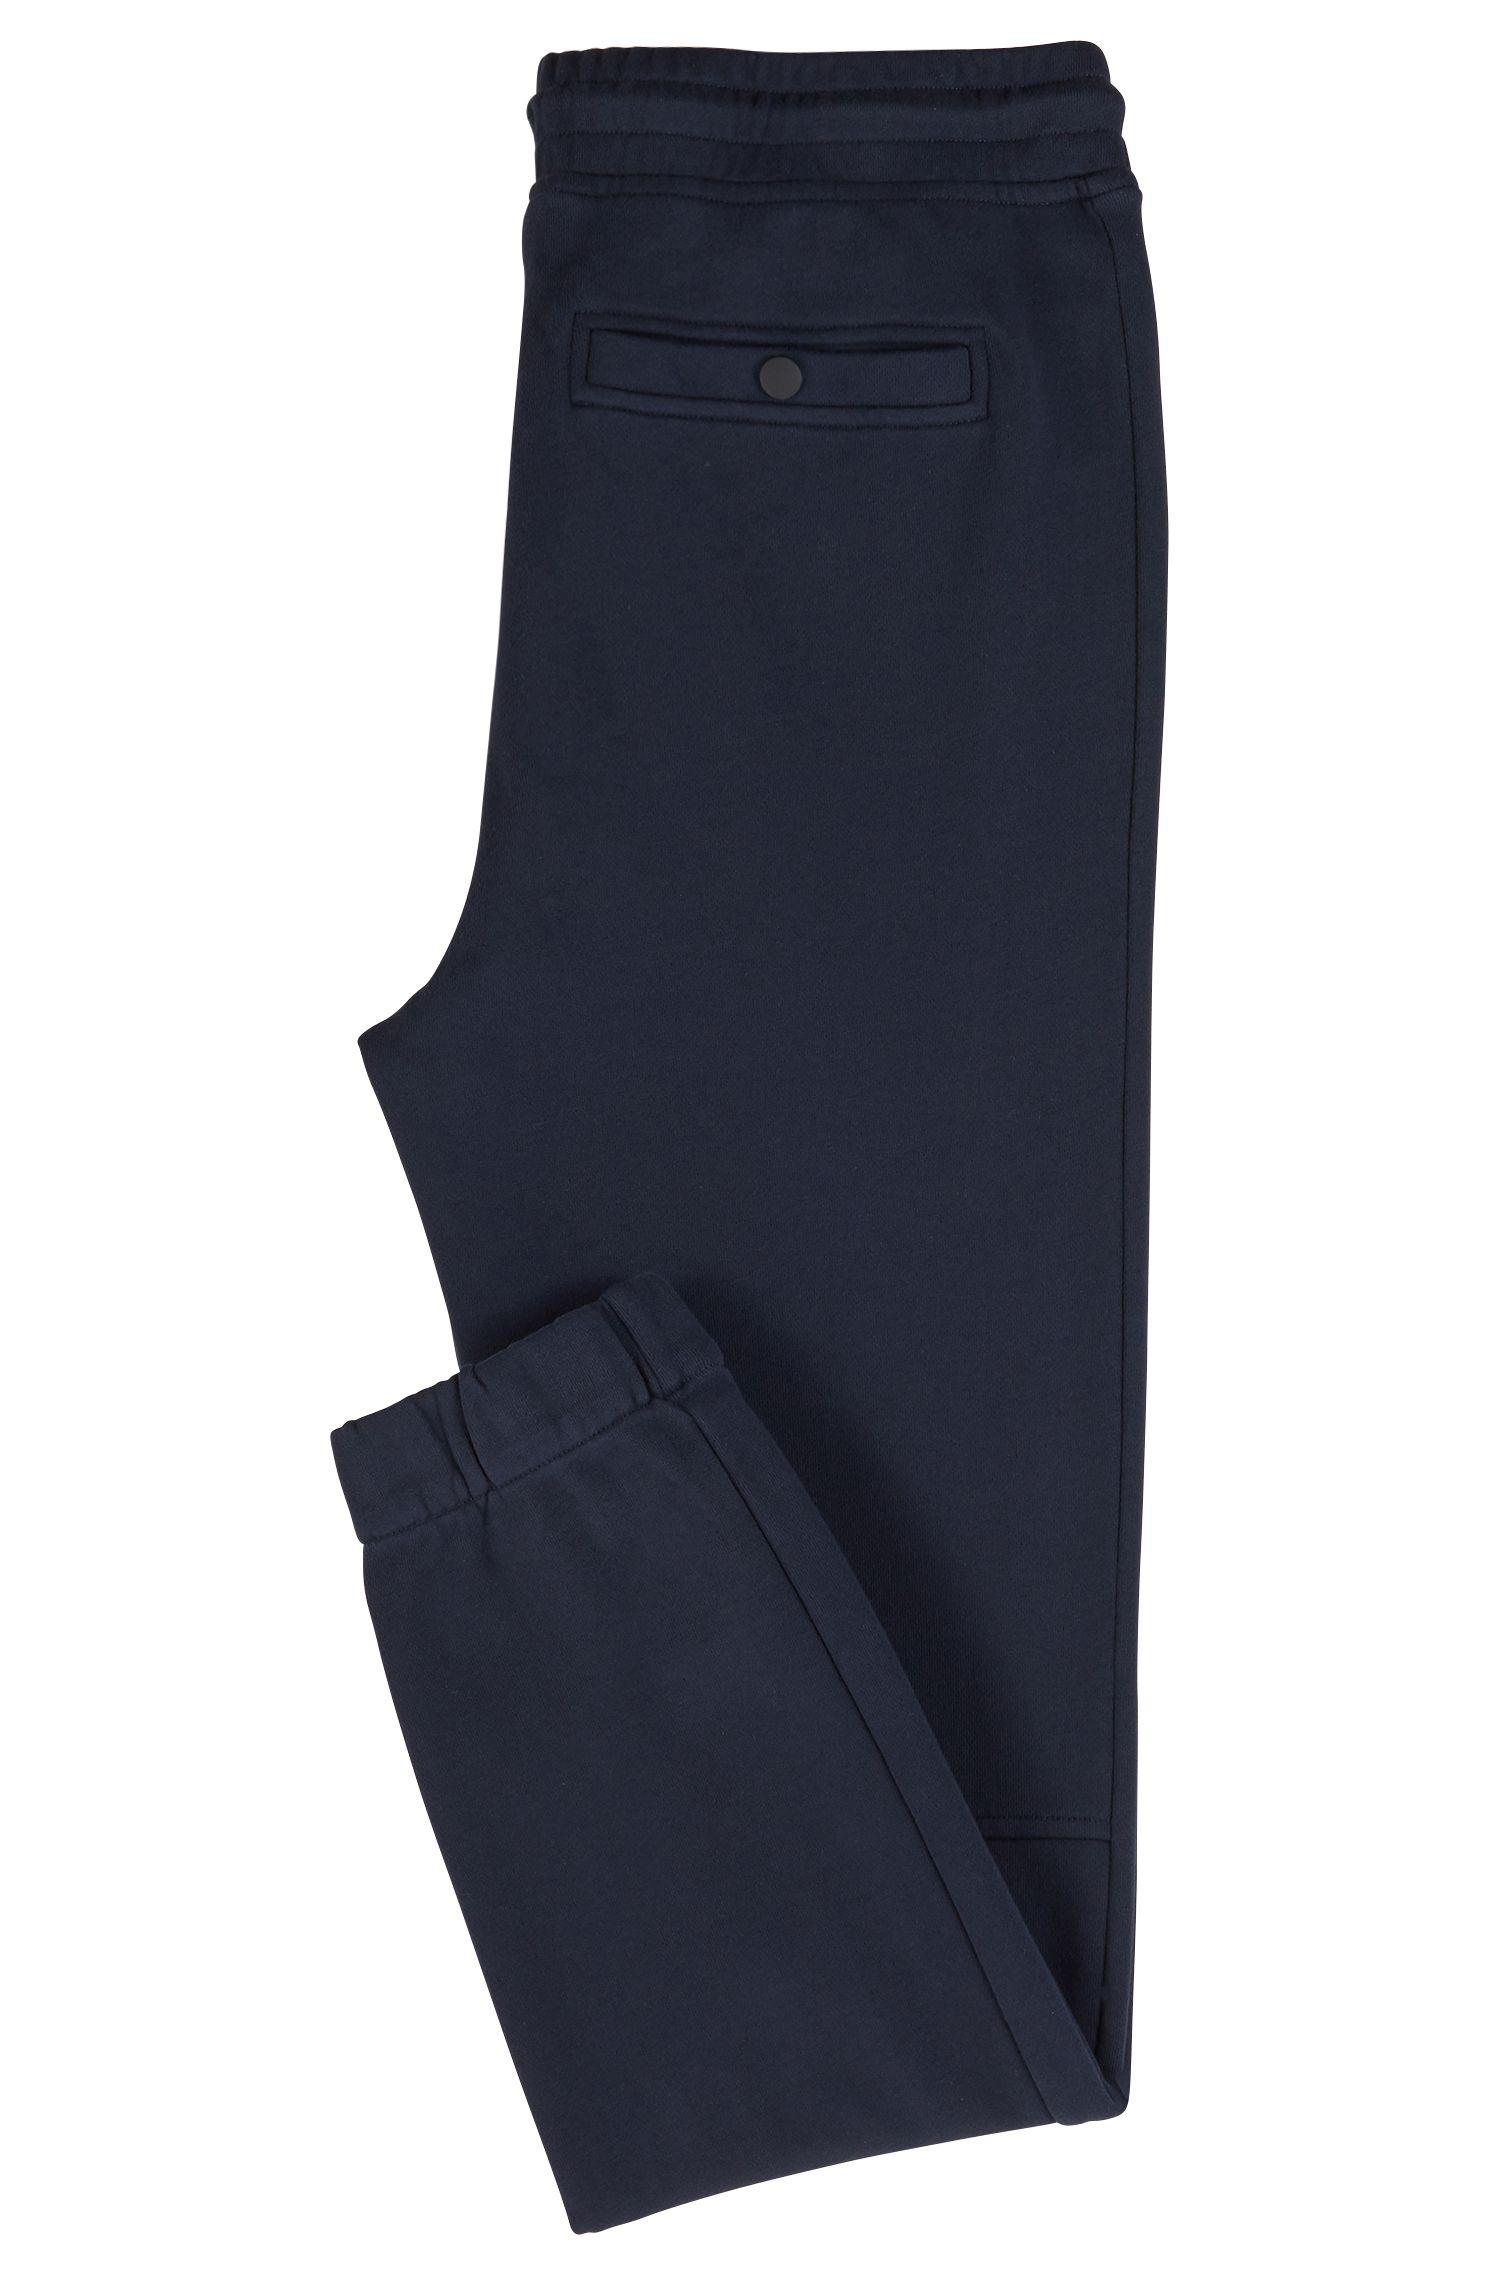 Relaxed-Fit Hose aus Baumwoll-Jersey mit Beinbündchen, Dunkelblau